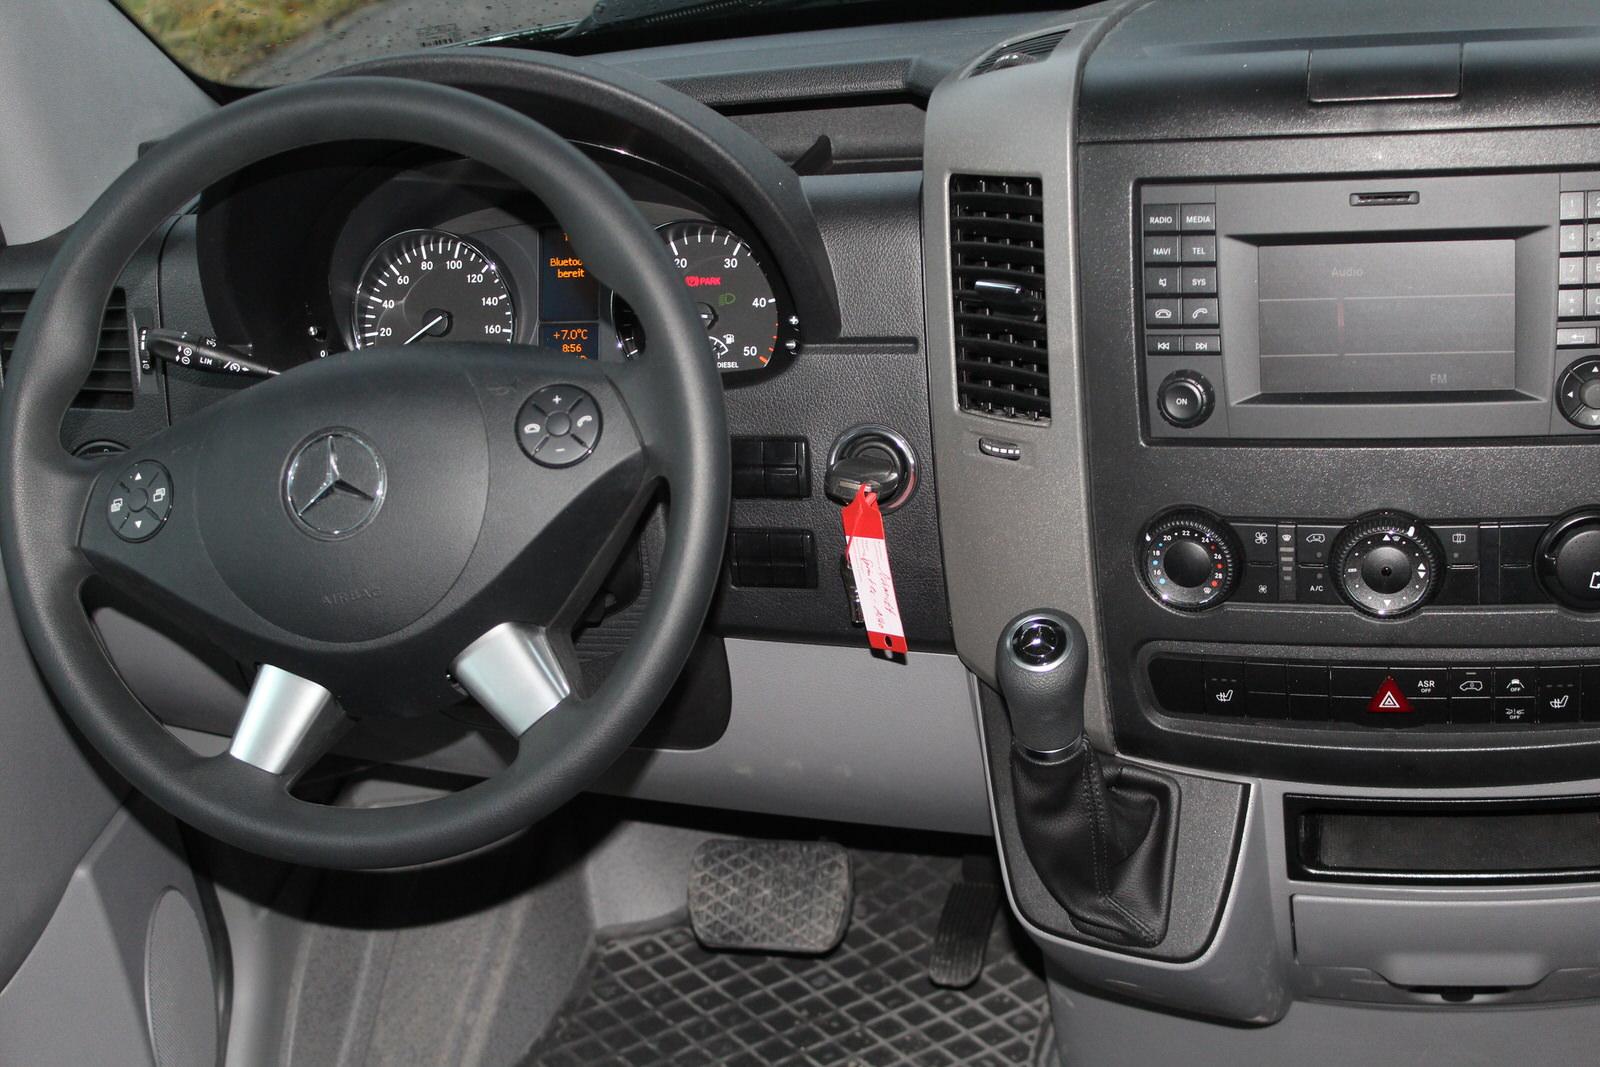 mercedes sprinter 316 cdi fahrgestell radstand 3600. Black Bedroom Furniture Sets. Home Design Ideas